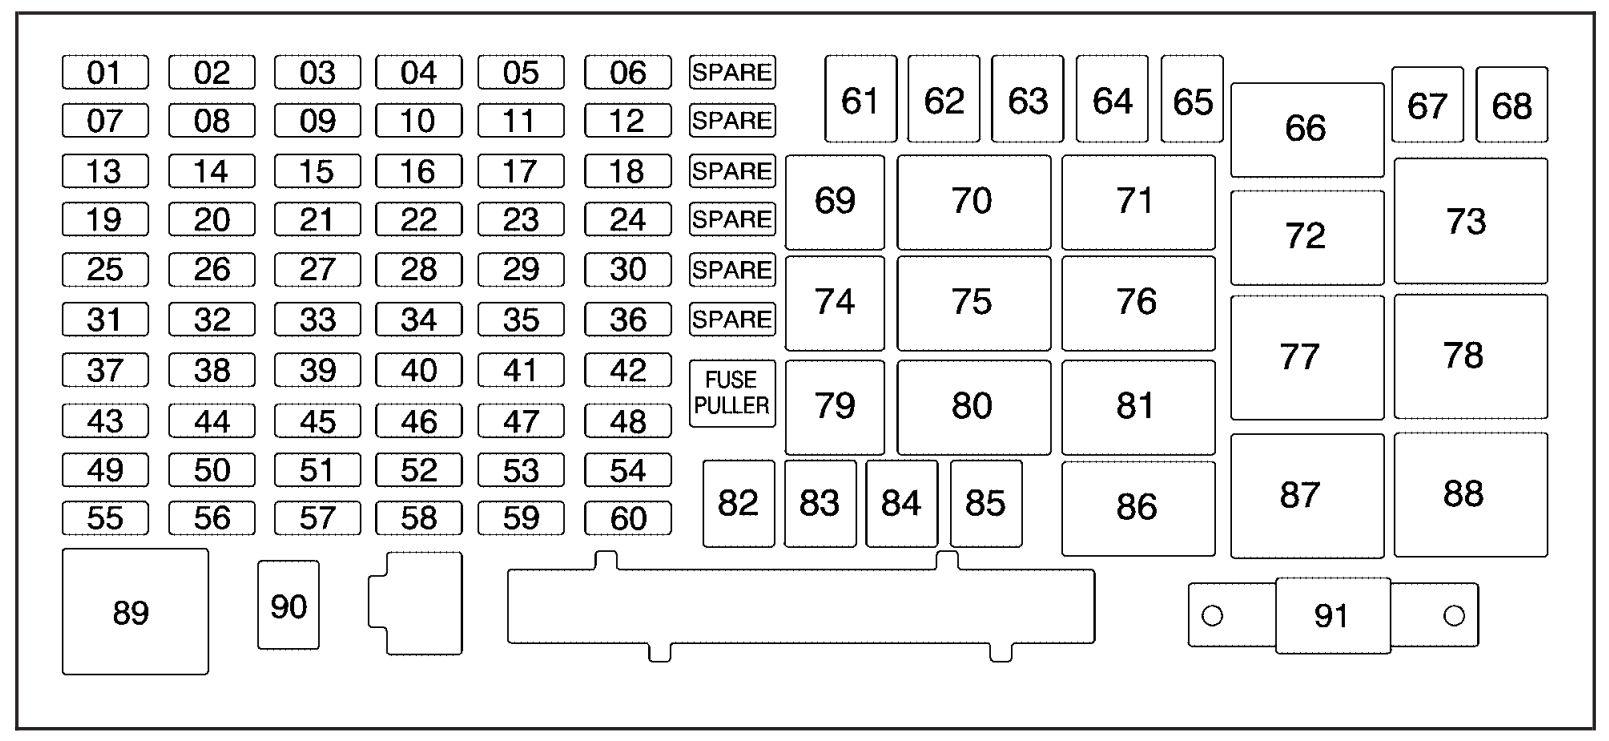 1994 Mercedesbenz E320 System Wiring Diagram Document Buzz